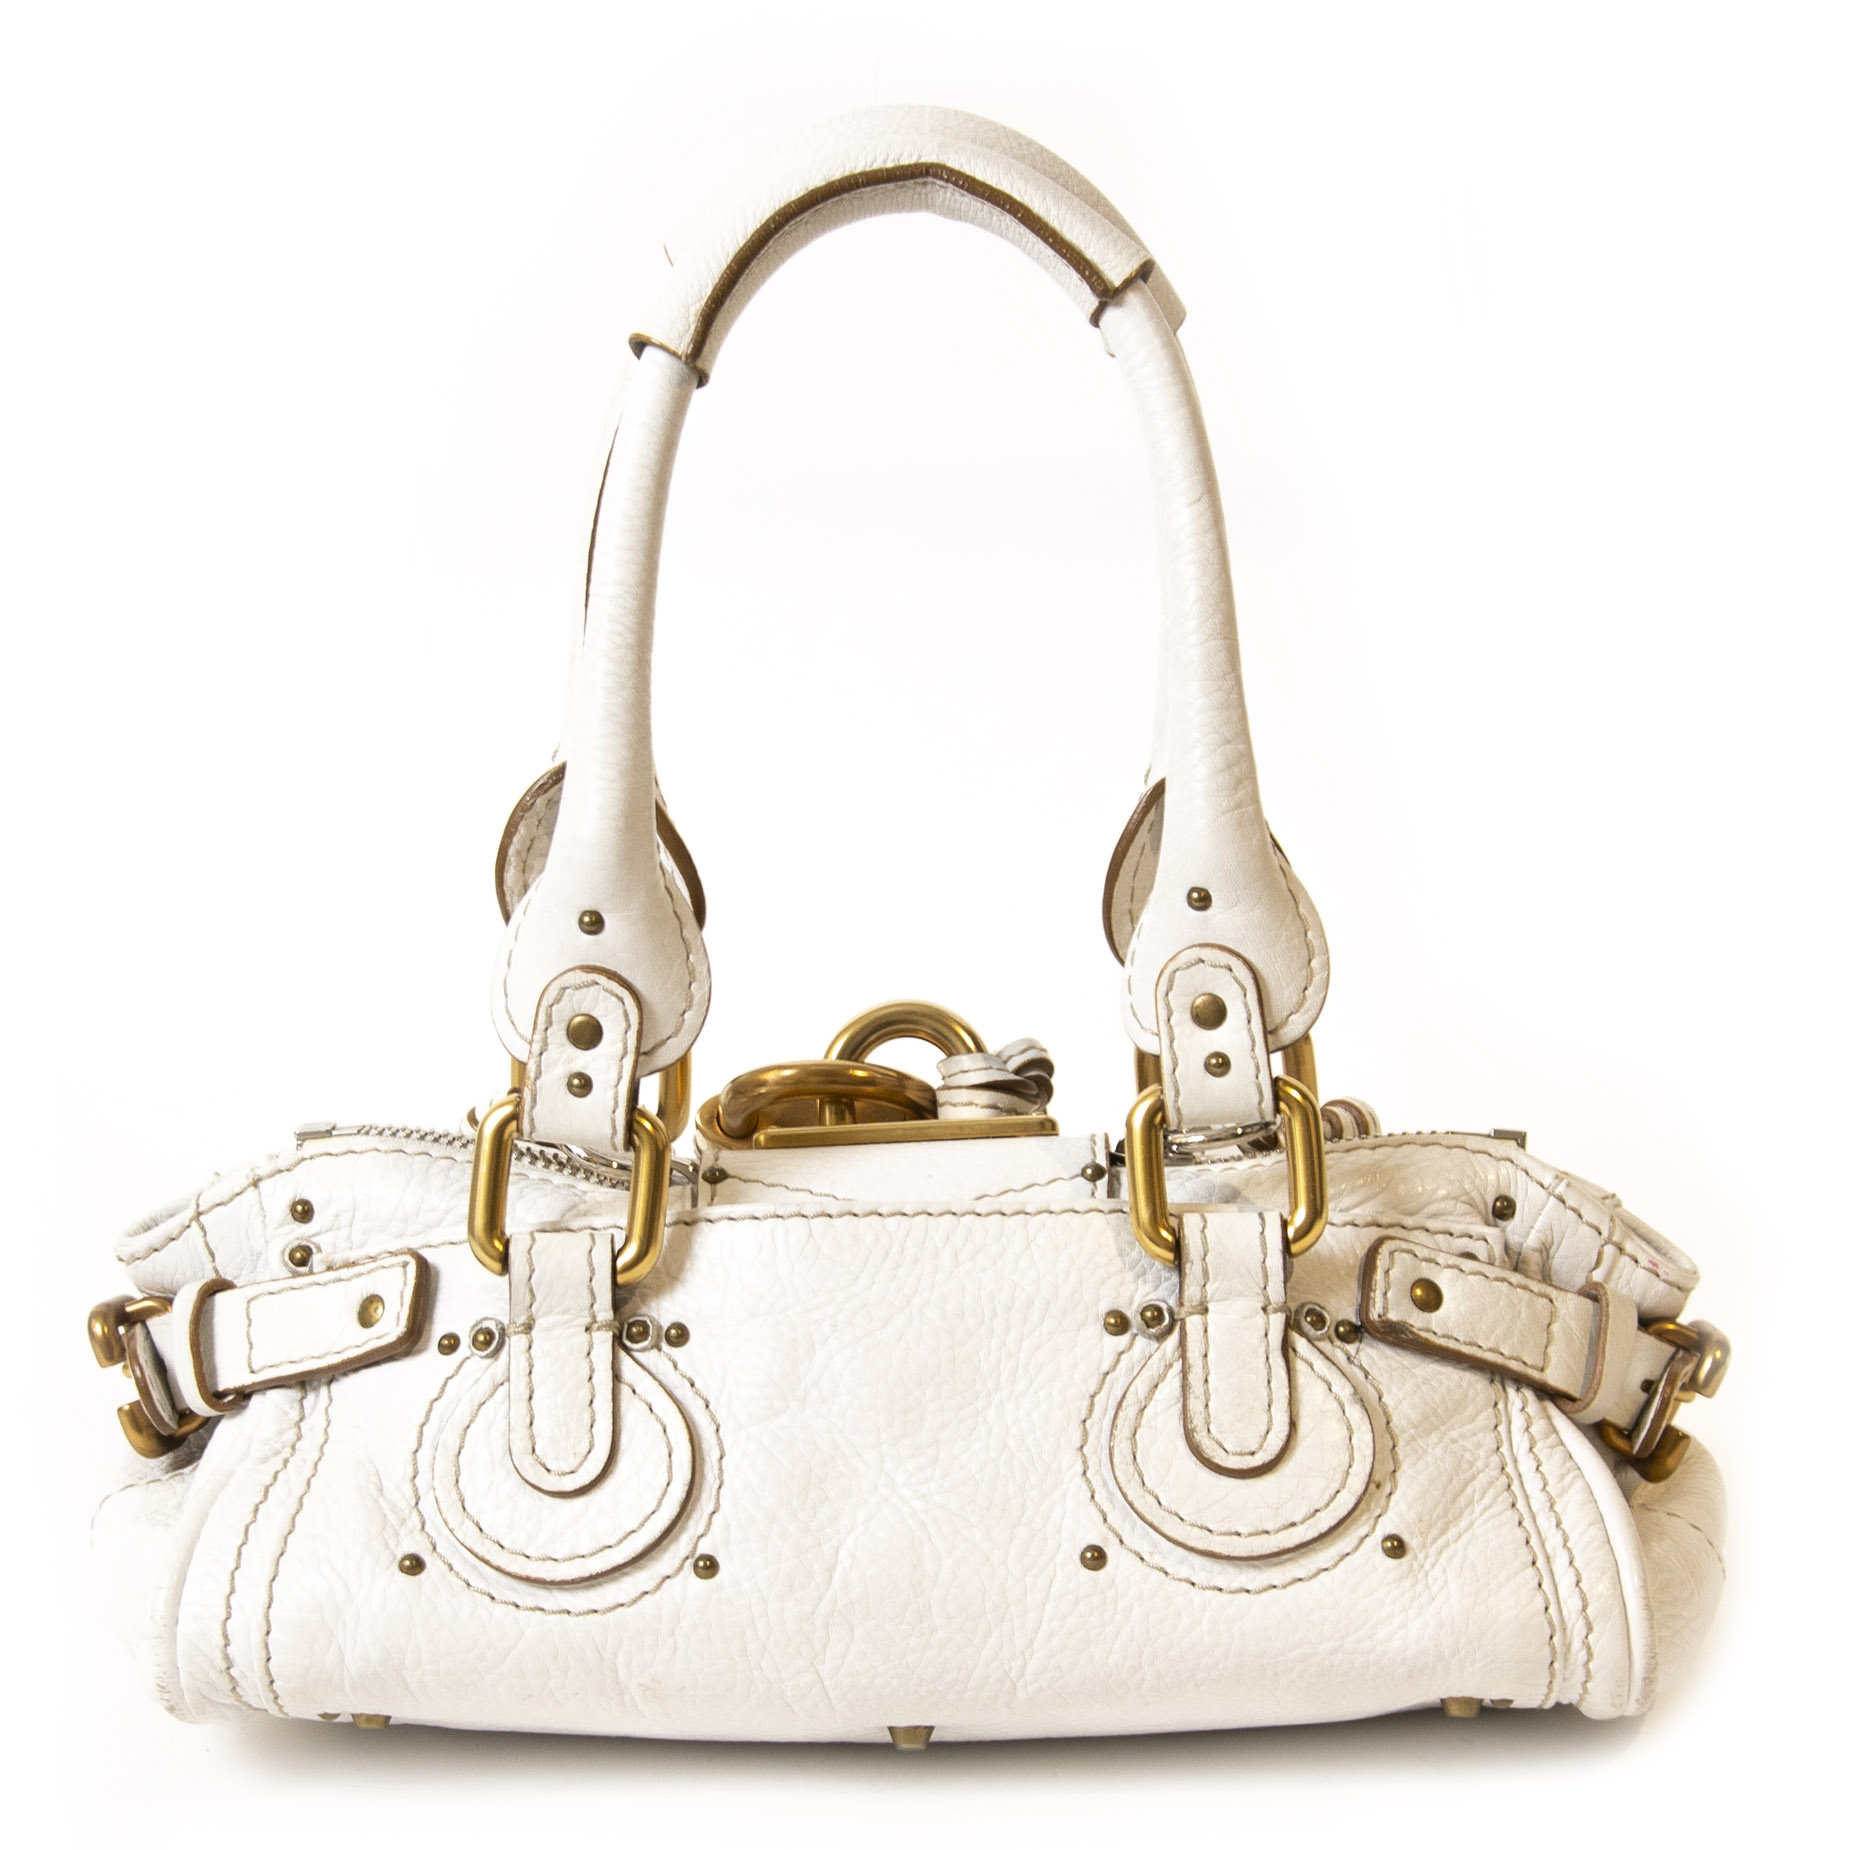 Authentieke Tweedehands Chloé White Leather Paddington Mini Bag juiste prijs veilig online shoppen luxe merken webshop winkelen Antwerpen België mode fashion